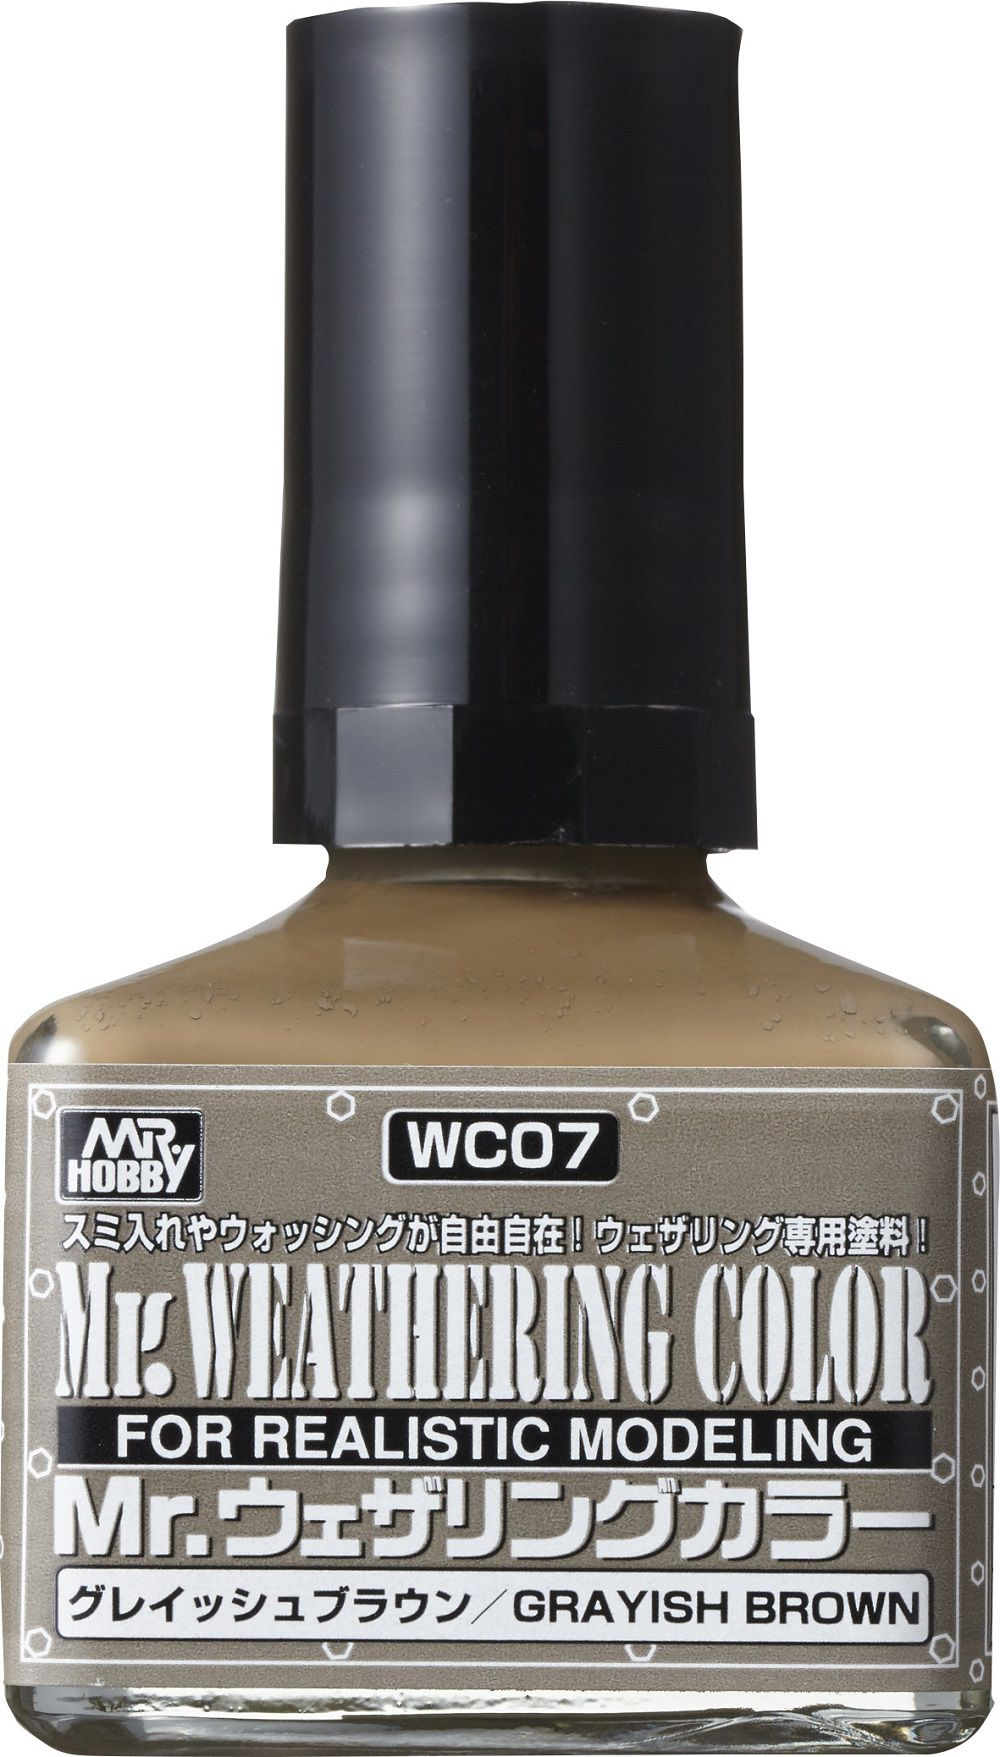 Mr Hobby Mr. Weathering Color - Grayish Brown - 40ml